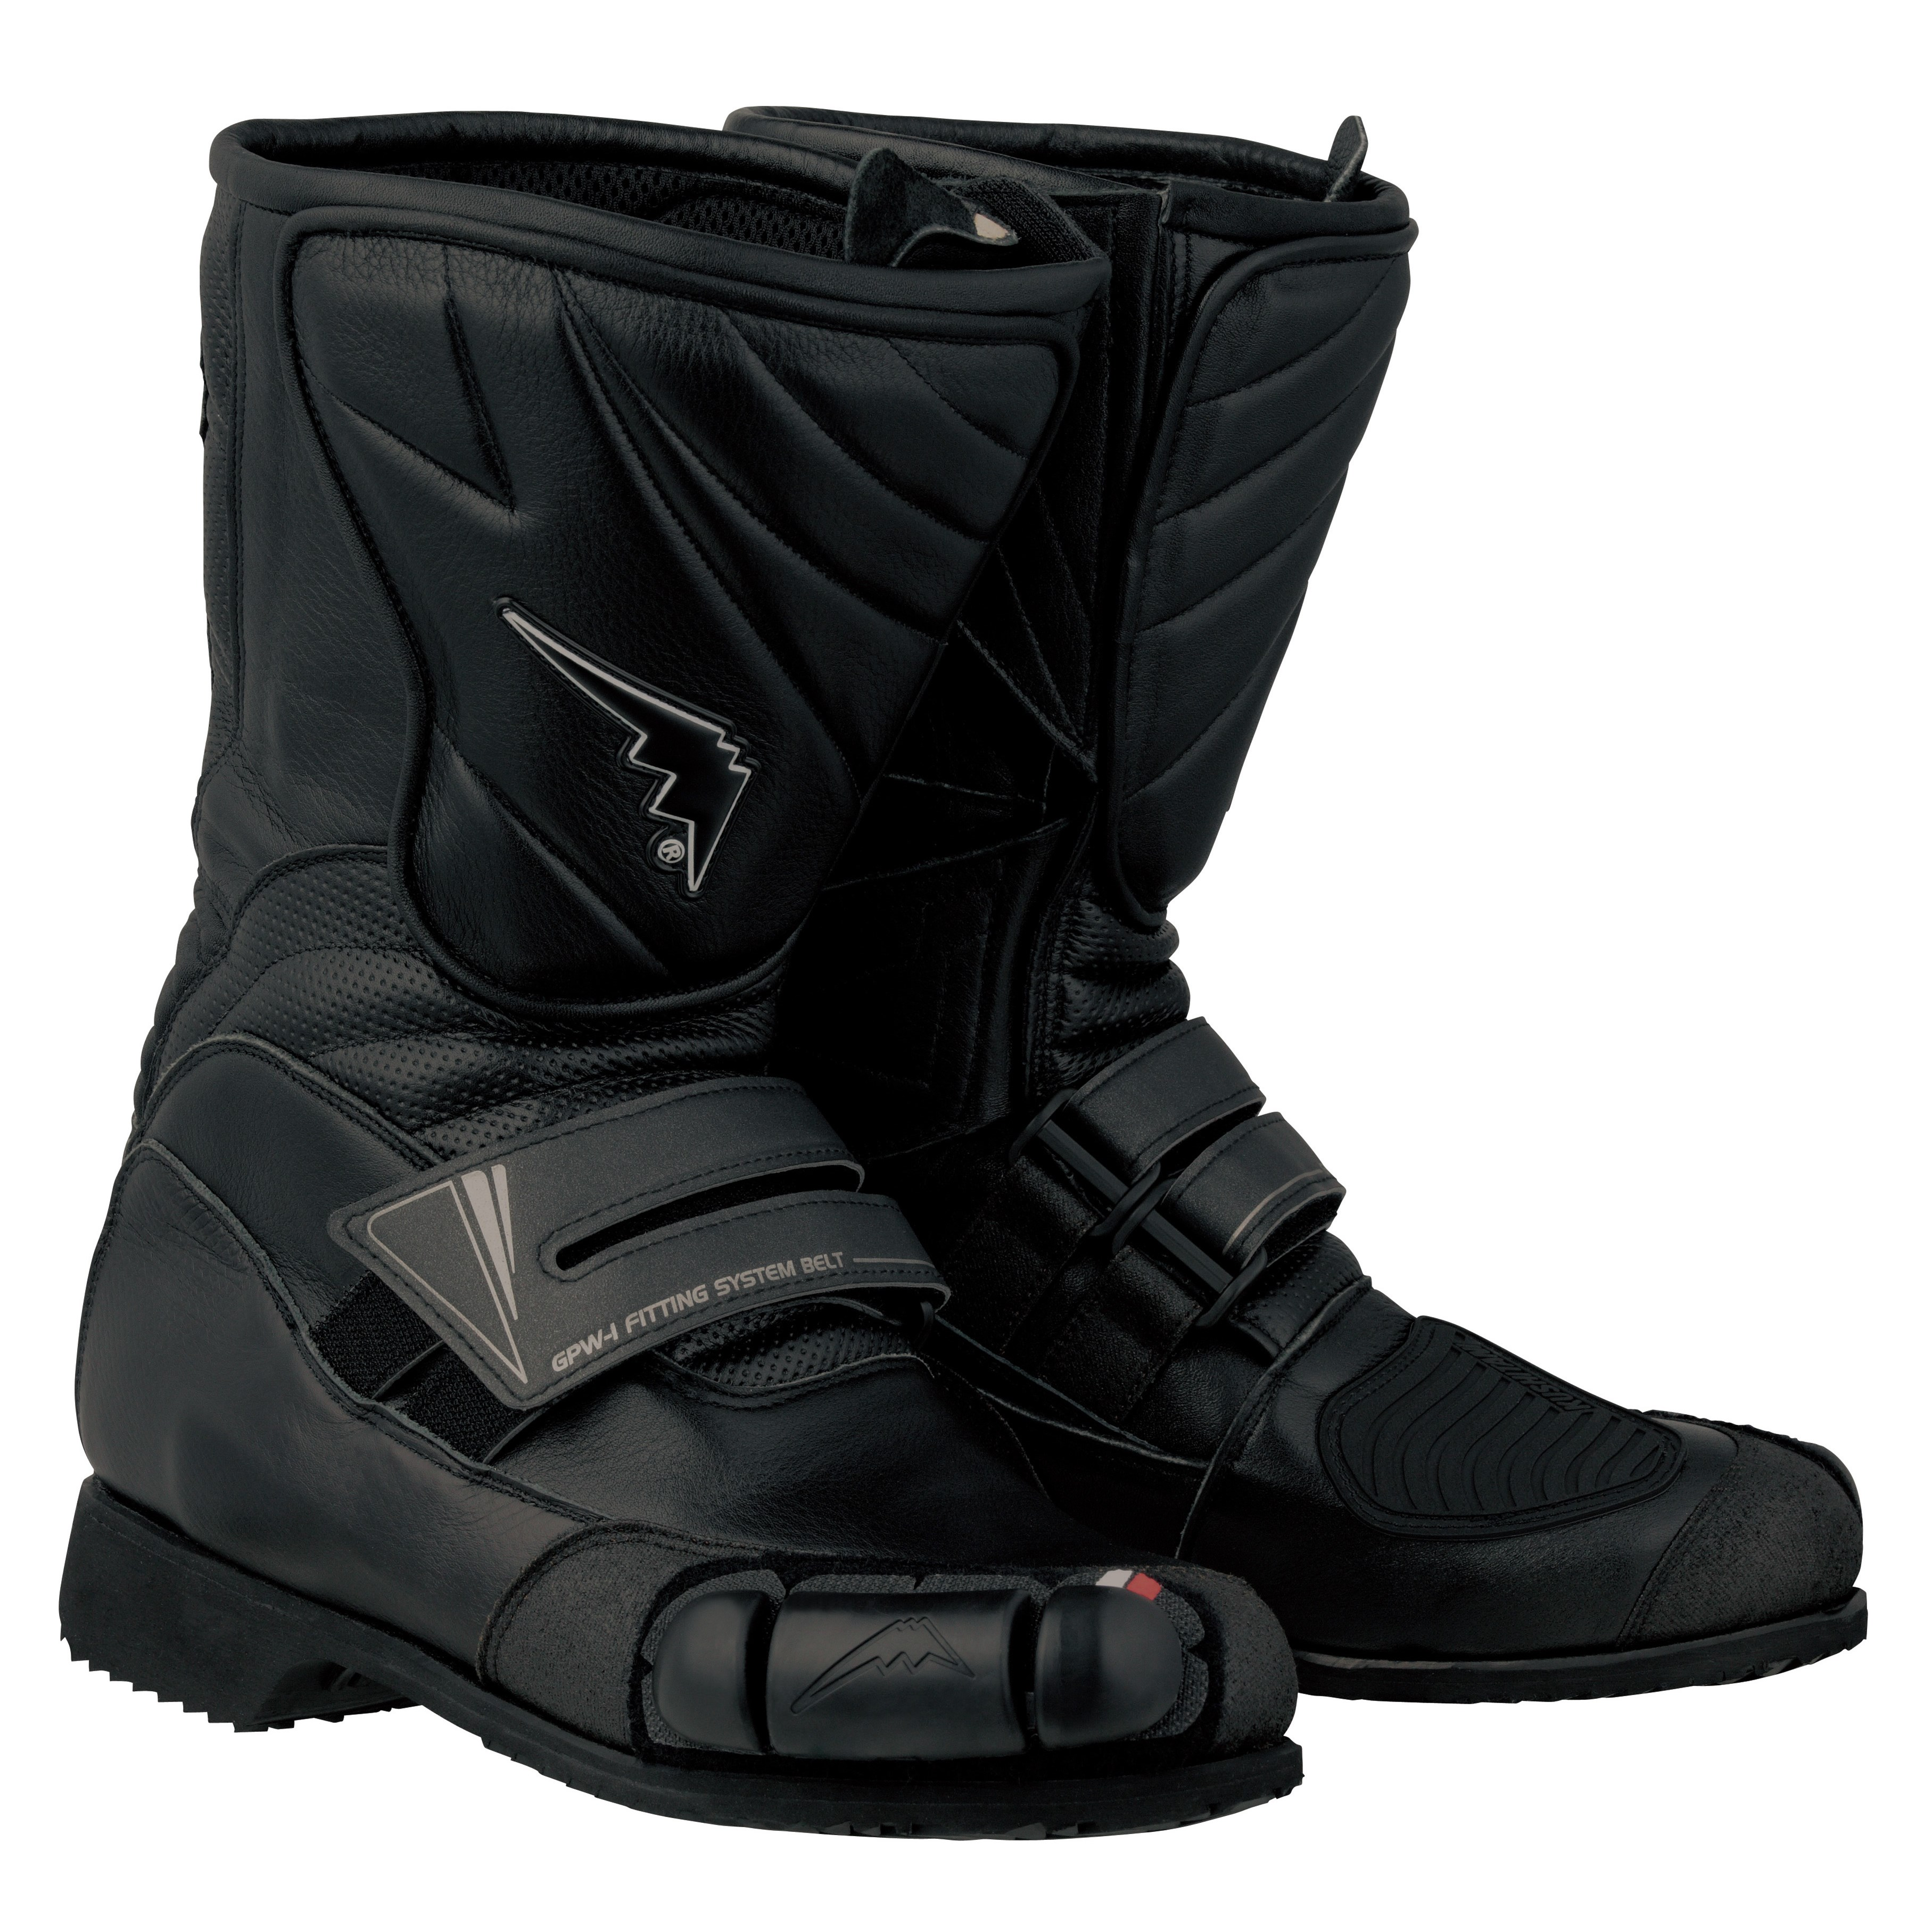 k-4515r-boots.jpg